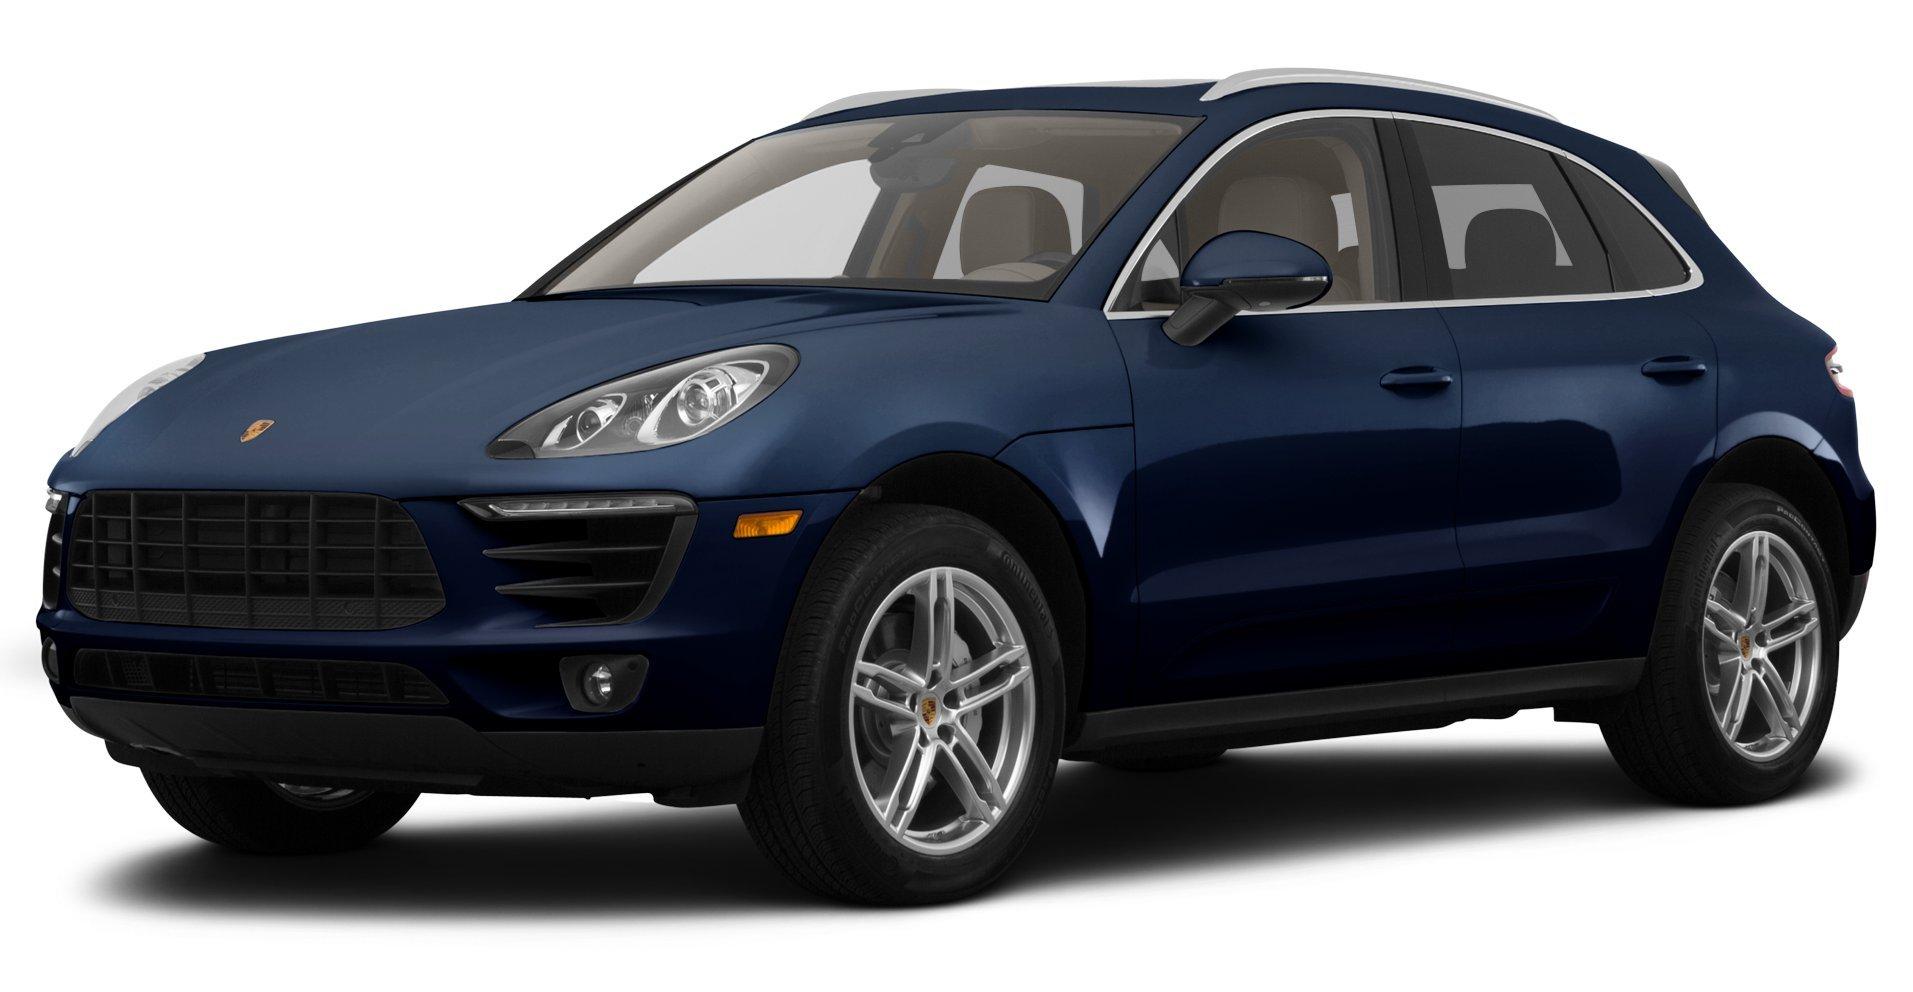 ... 2018 Porsche Macan Turbo, All Wheel Drive ...